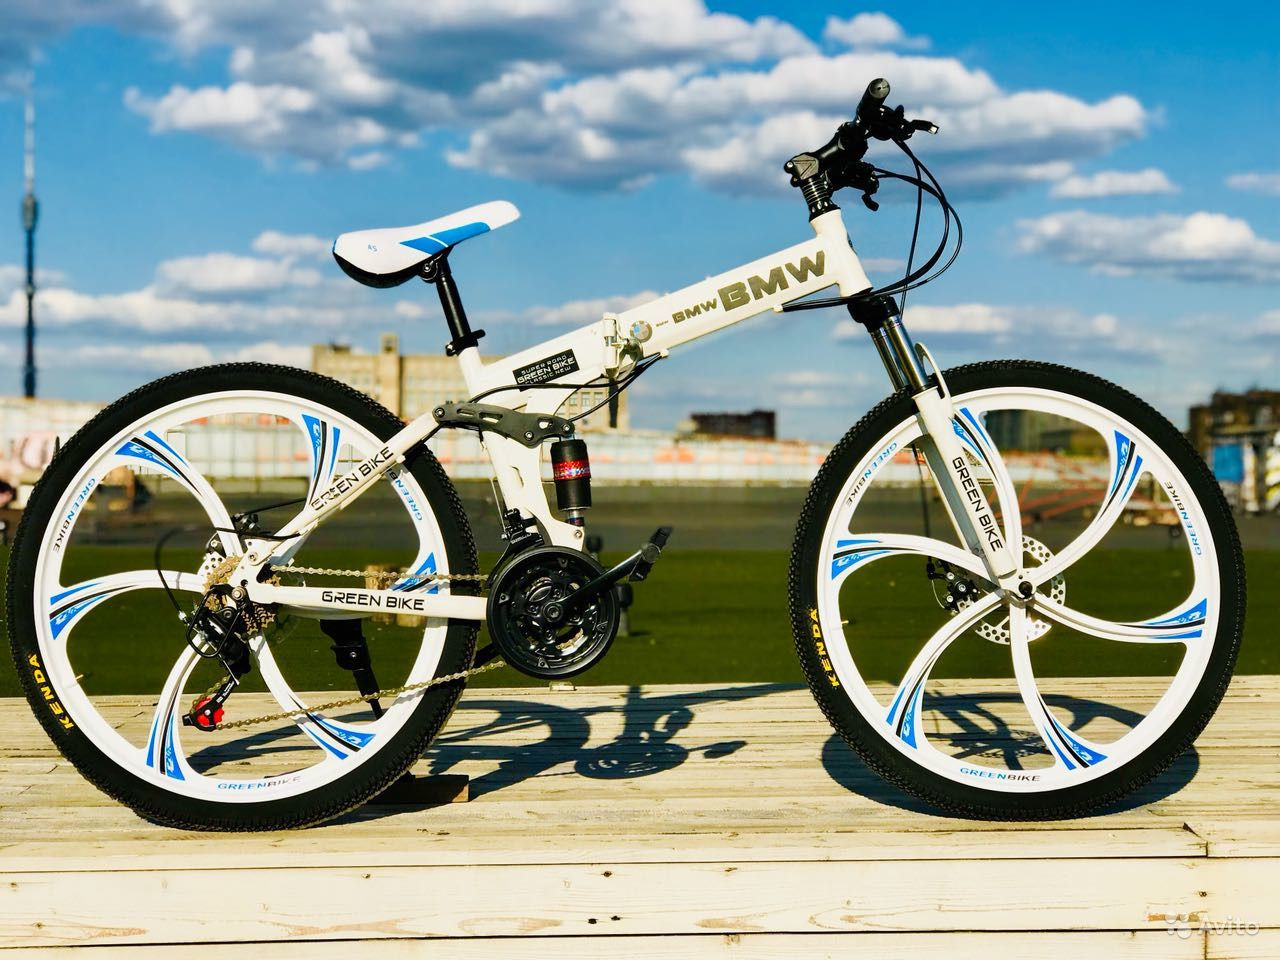 Картинки велосипедов на авито